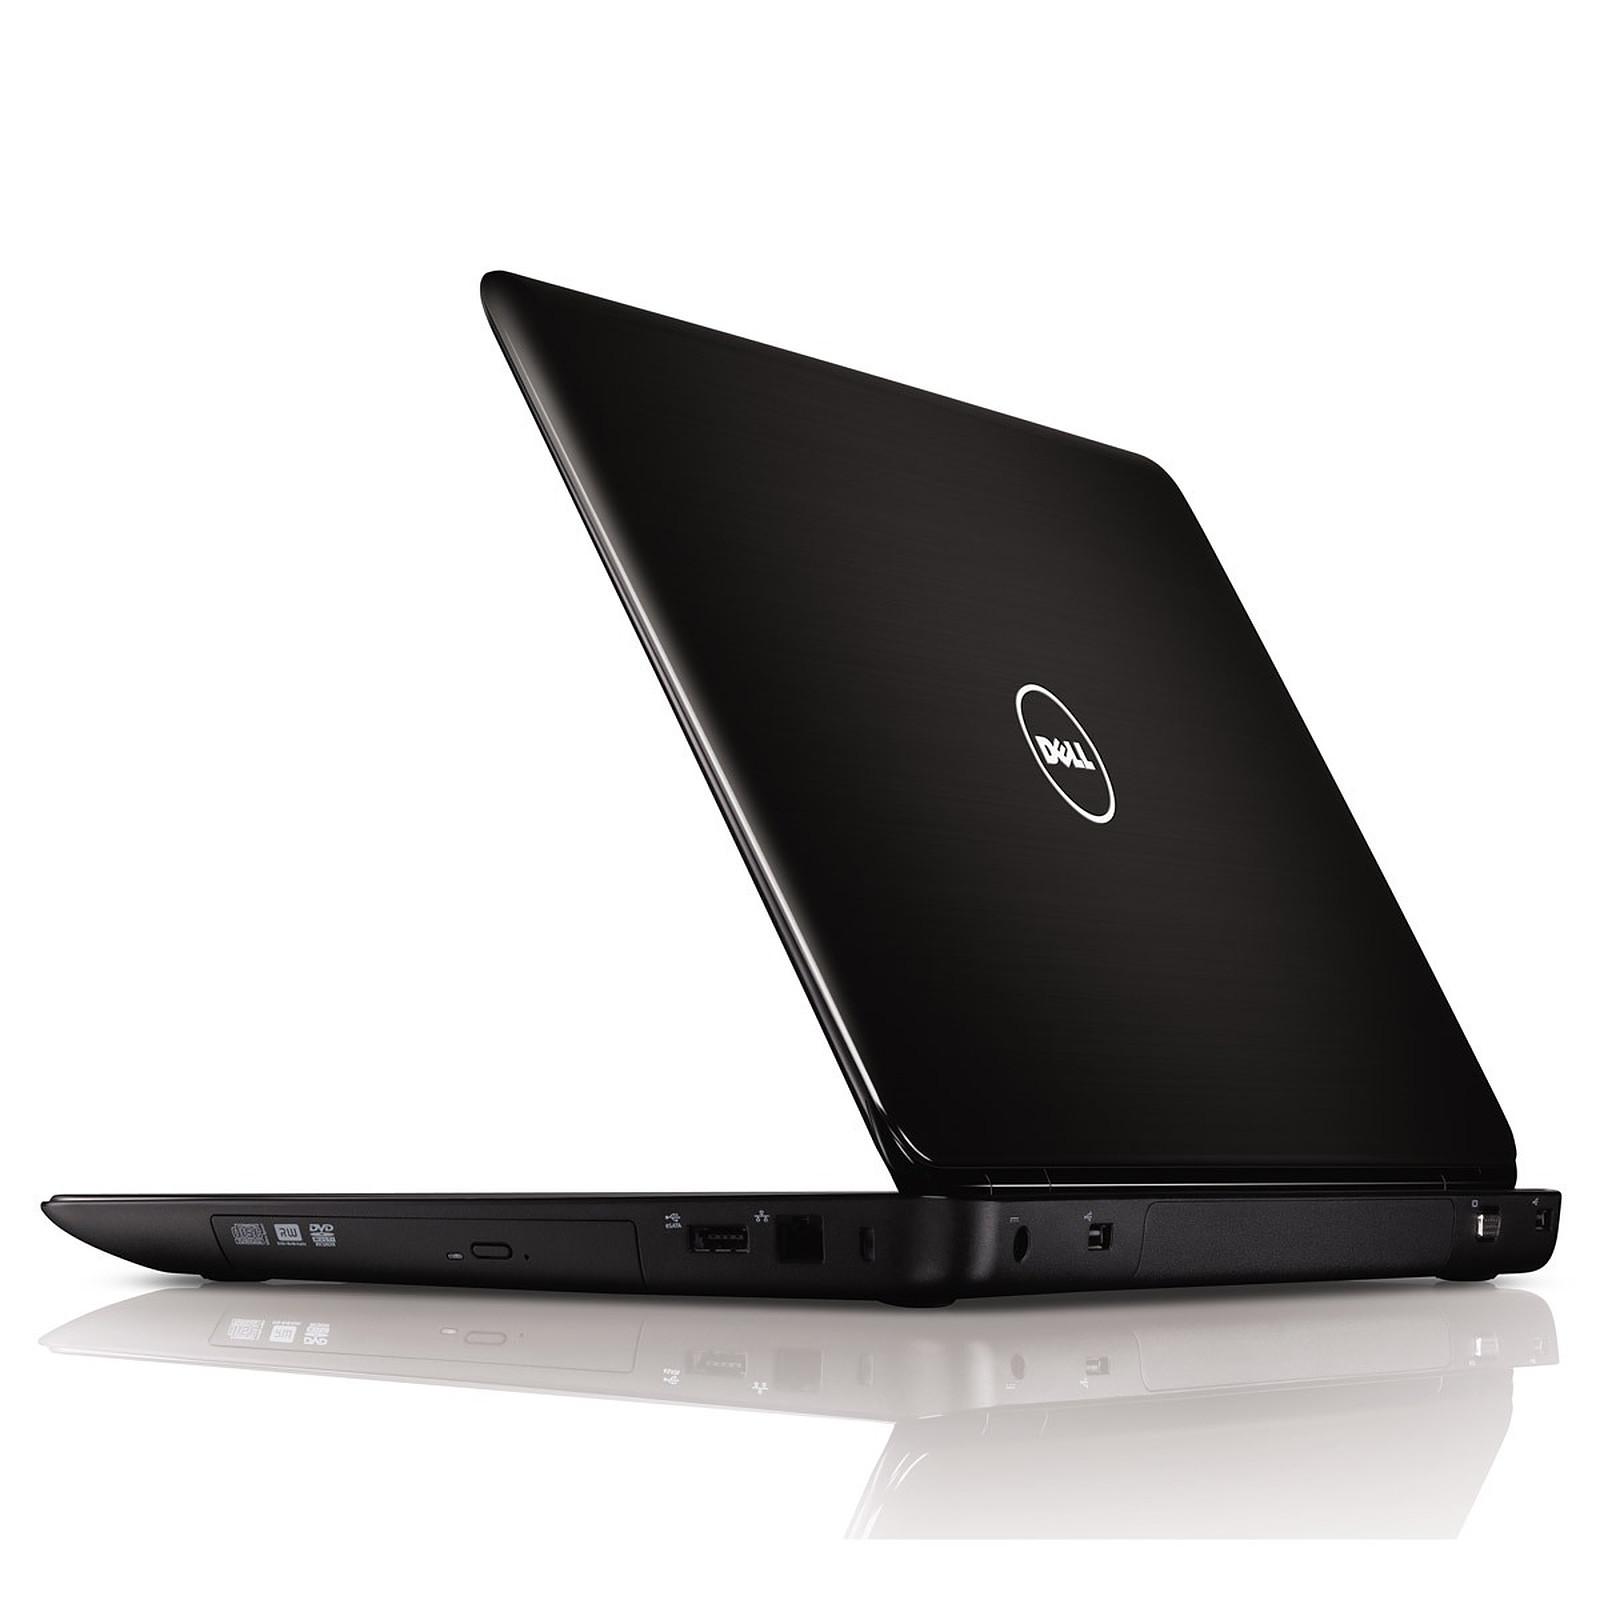 Dell Inspiron 17R Noir